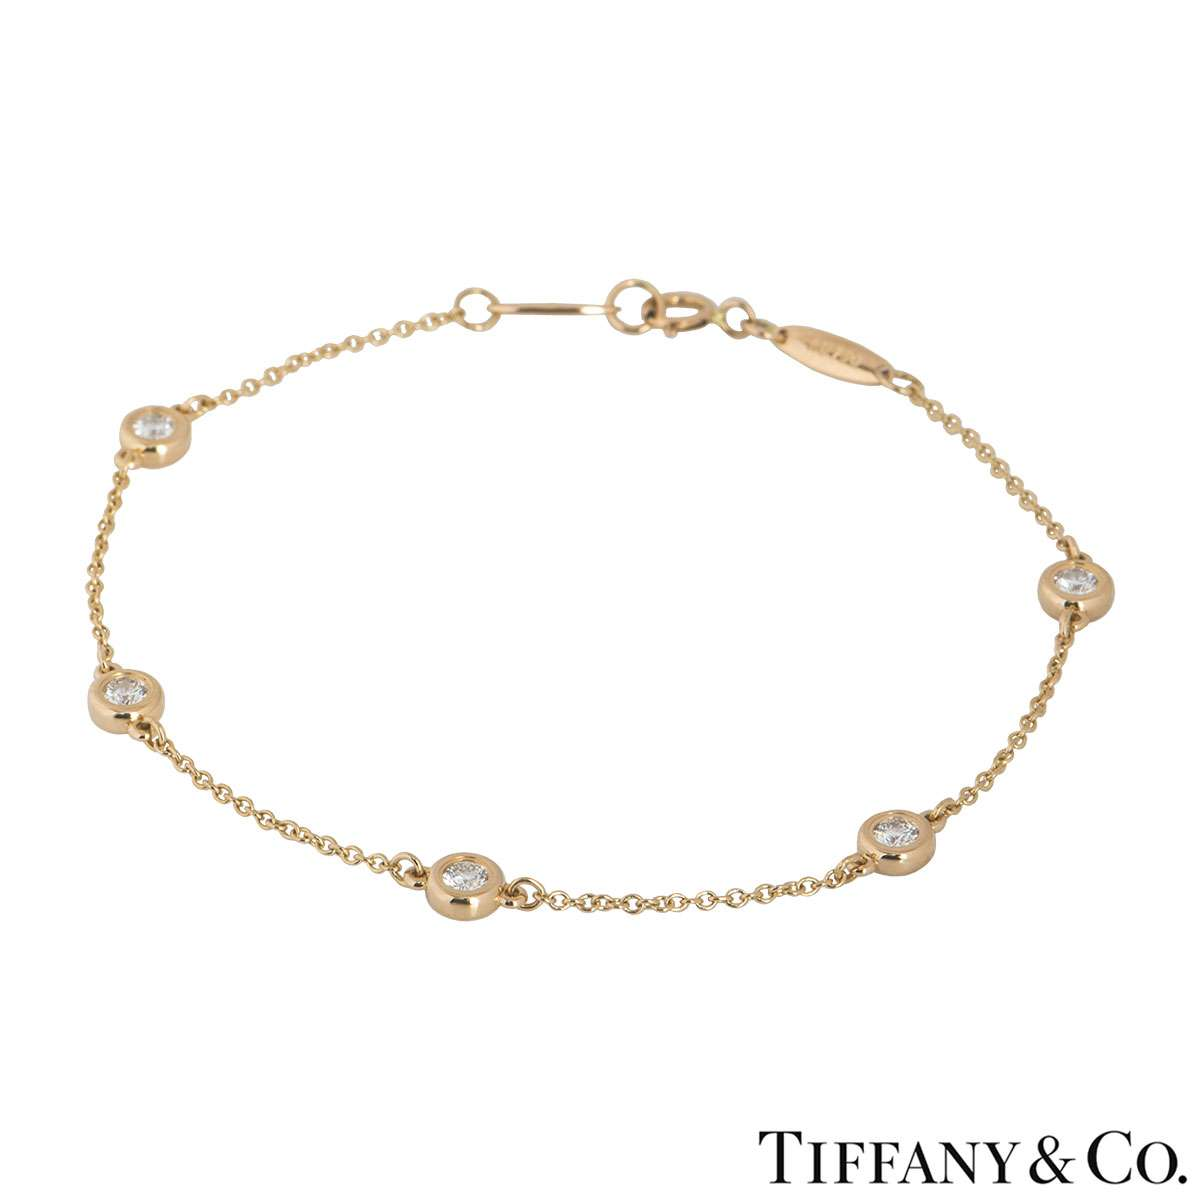 Tiffany & co. Rose Gold Elsa Peretti Diamonds by the Yard Bracelet